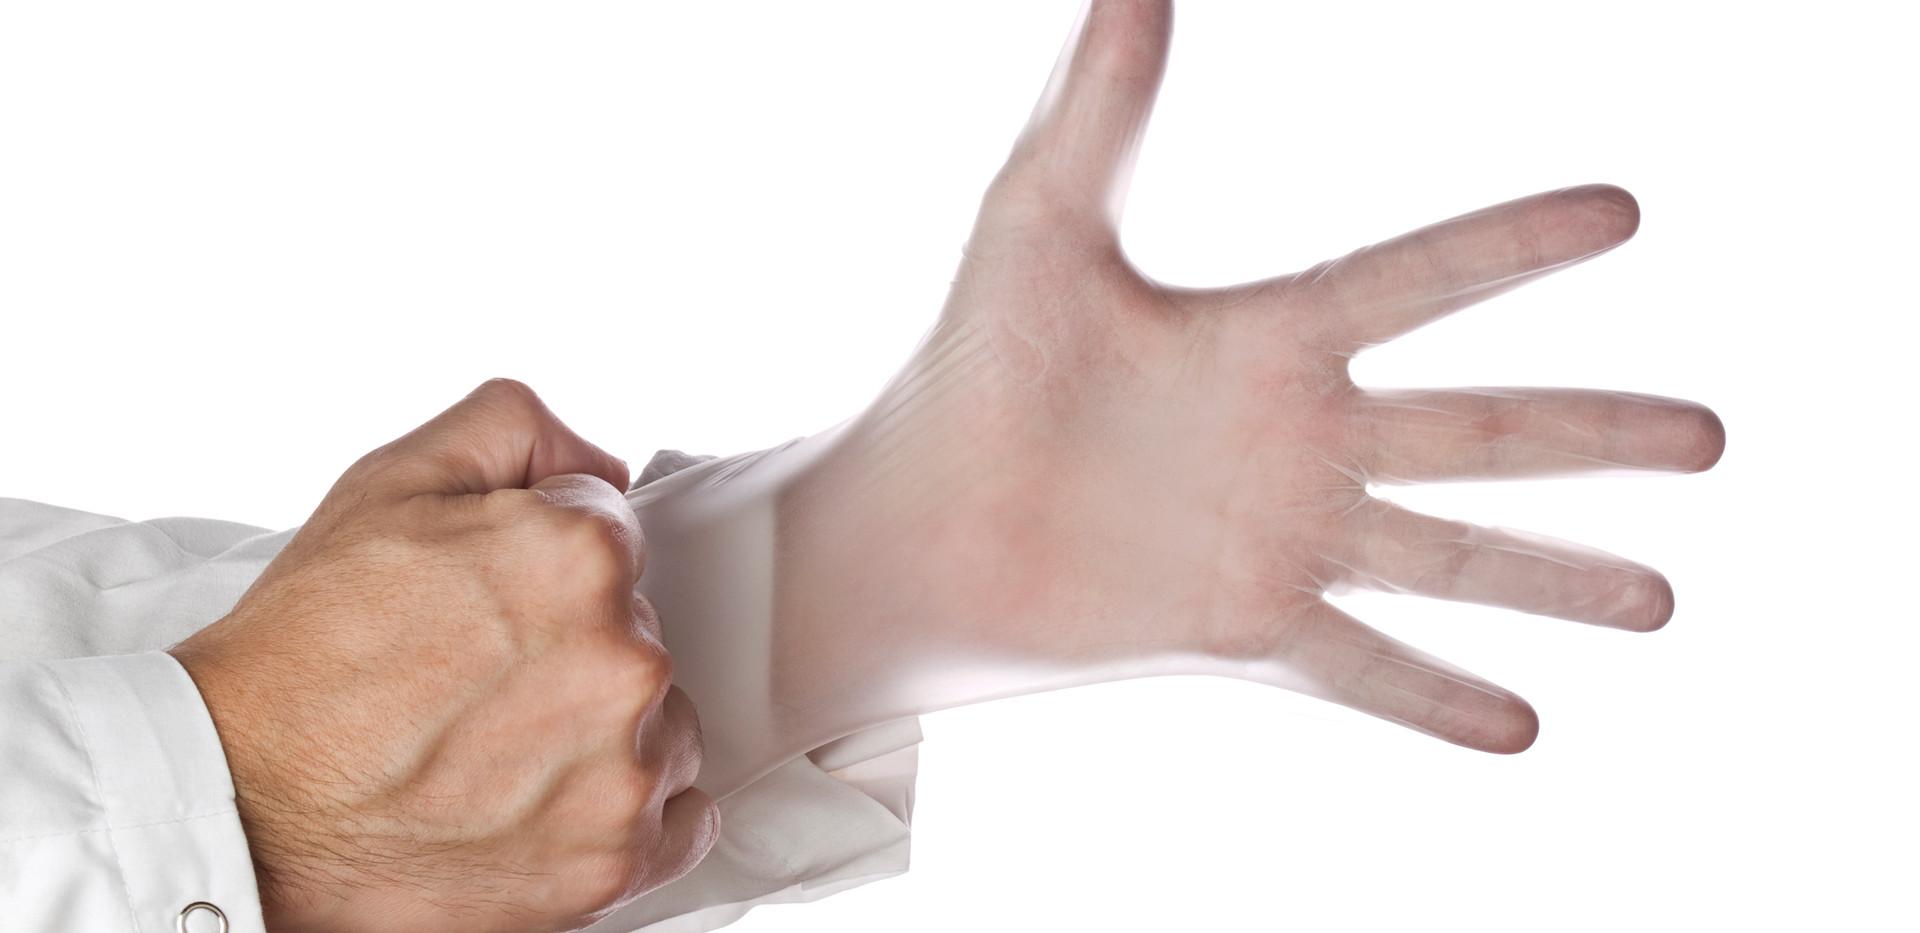 Clear Disposable Vinyl Glove